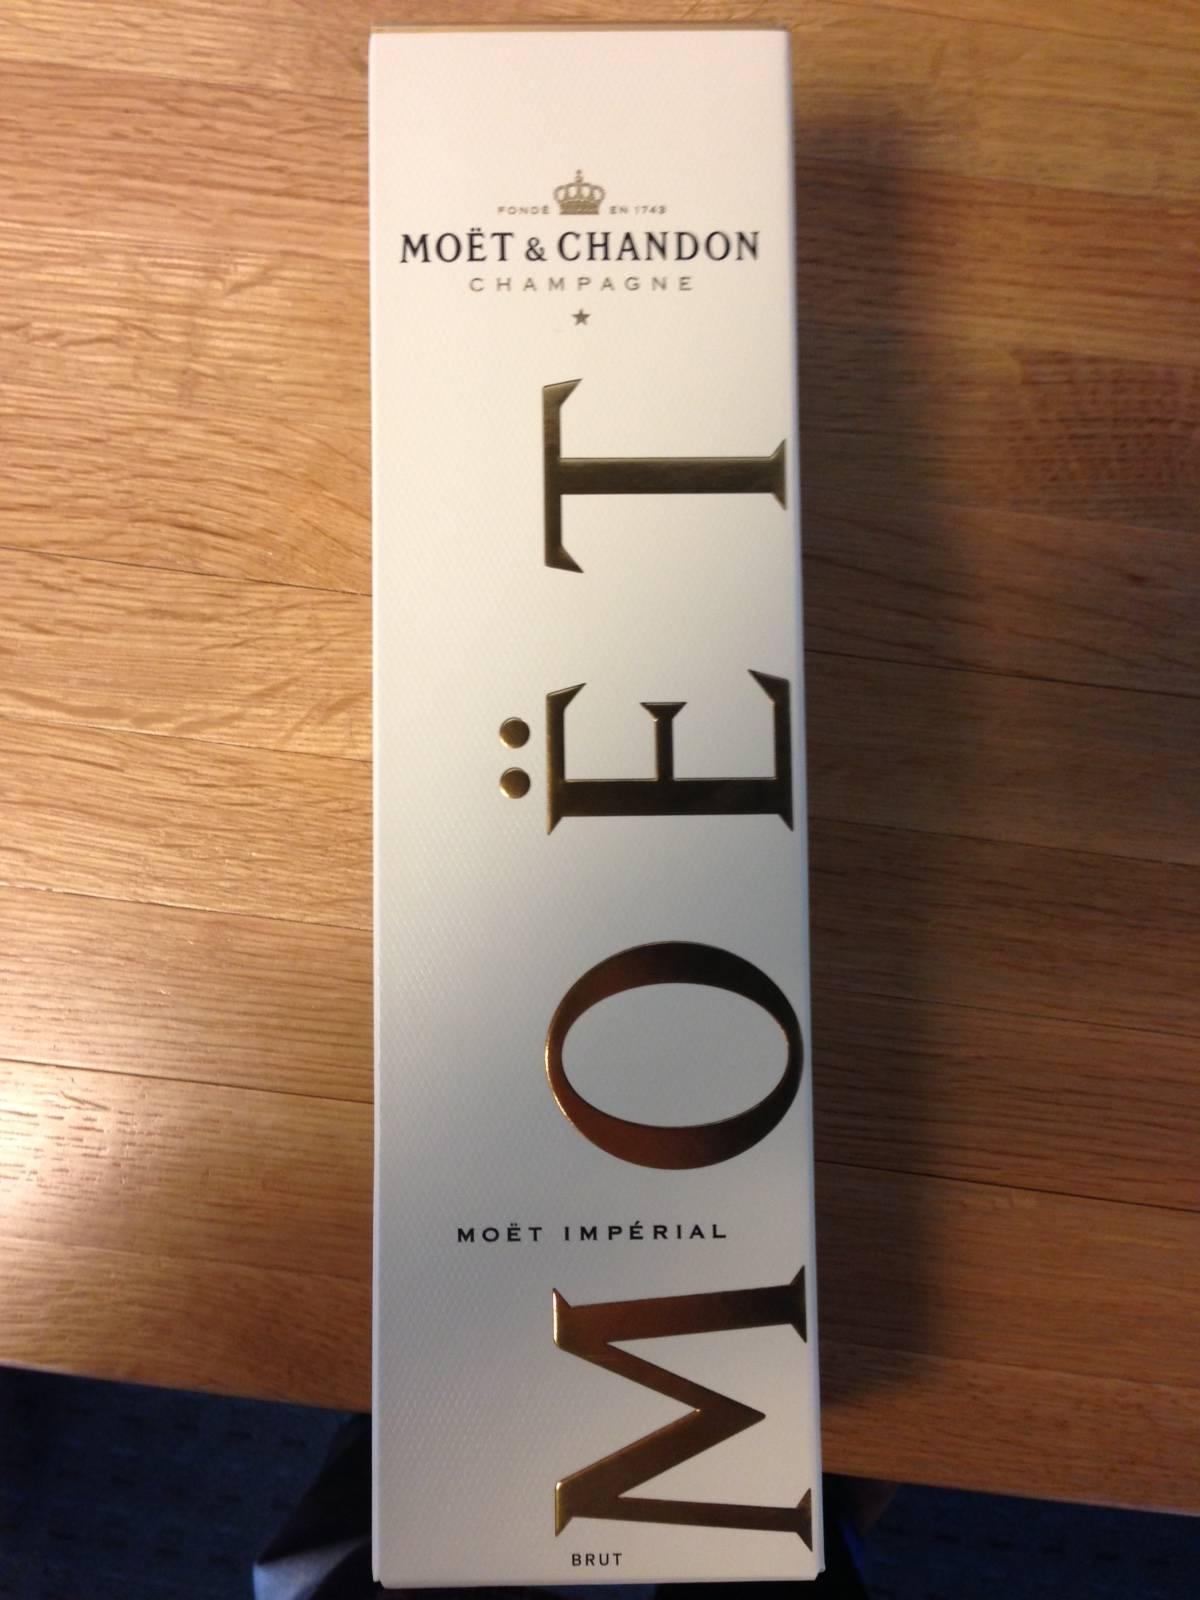 Champagnes Veuve Clicquot, Moet, etc